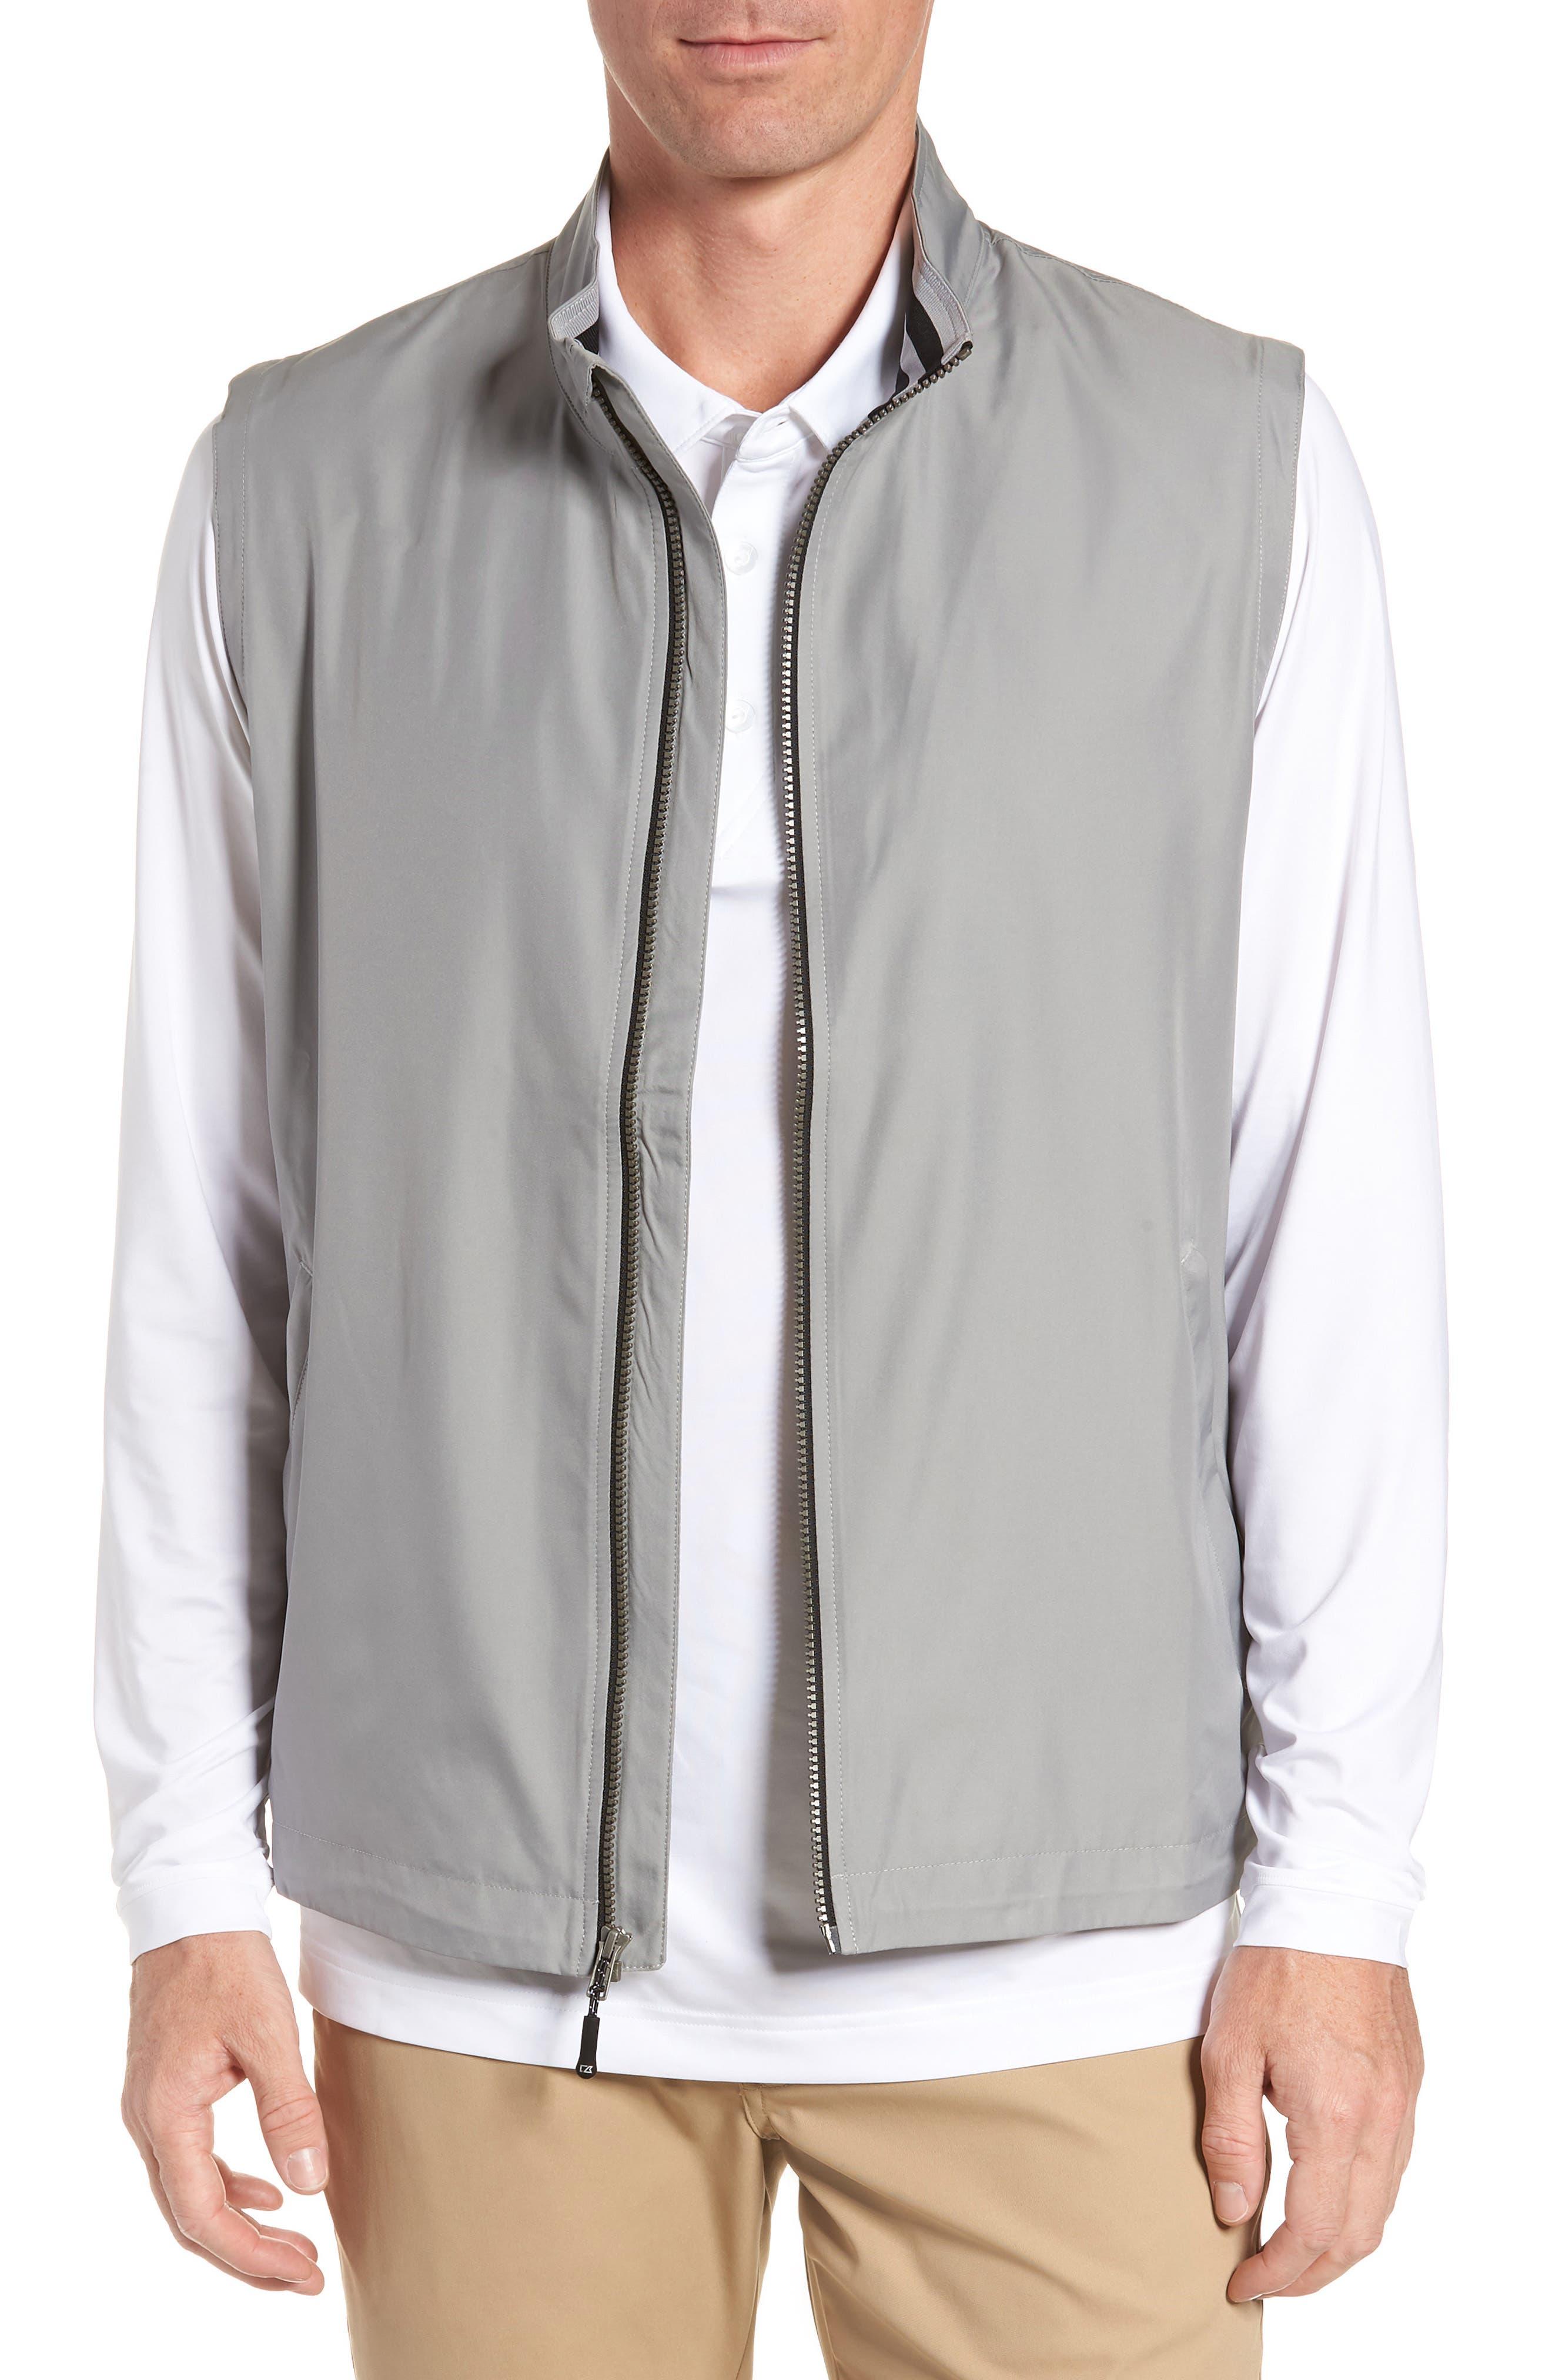 Nine Iron Drytec Zip Vest